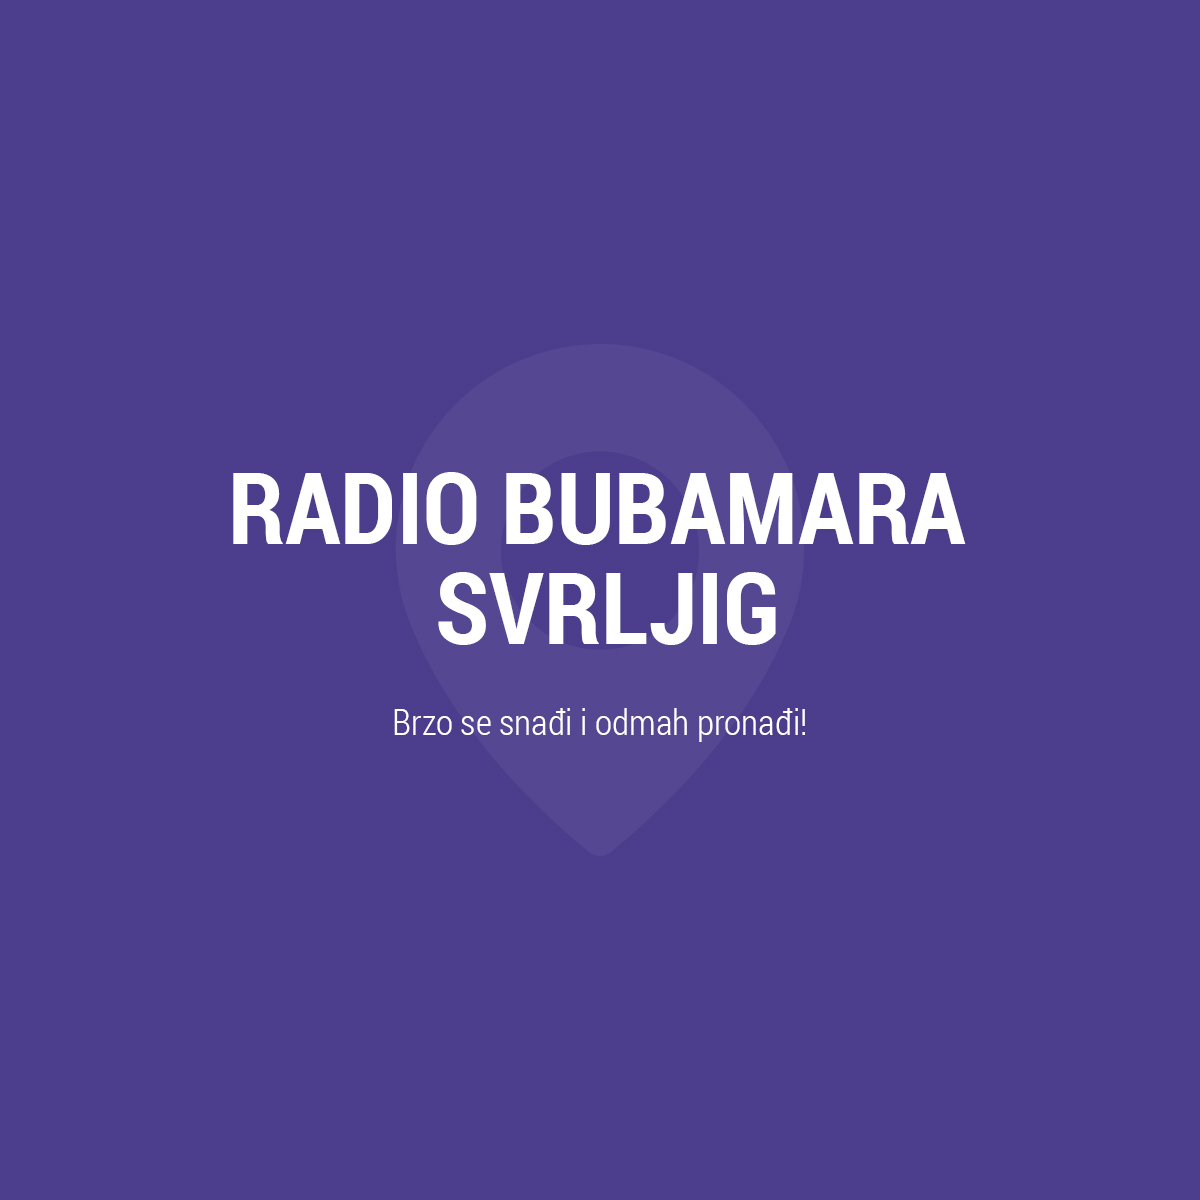 radio bubamara adresar thumb